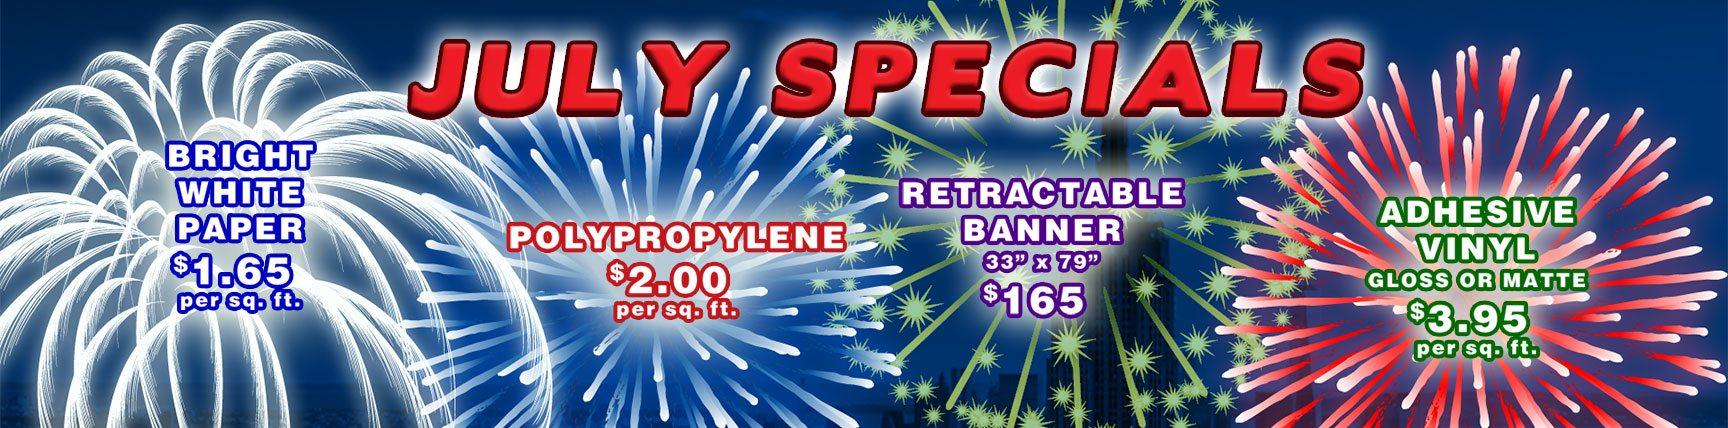 July_Specials